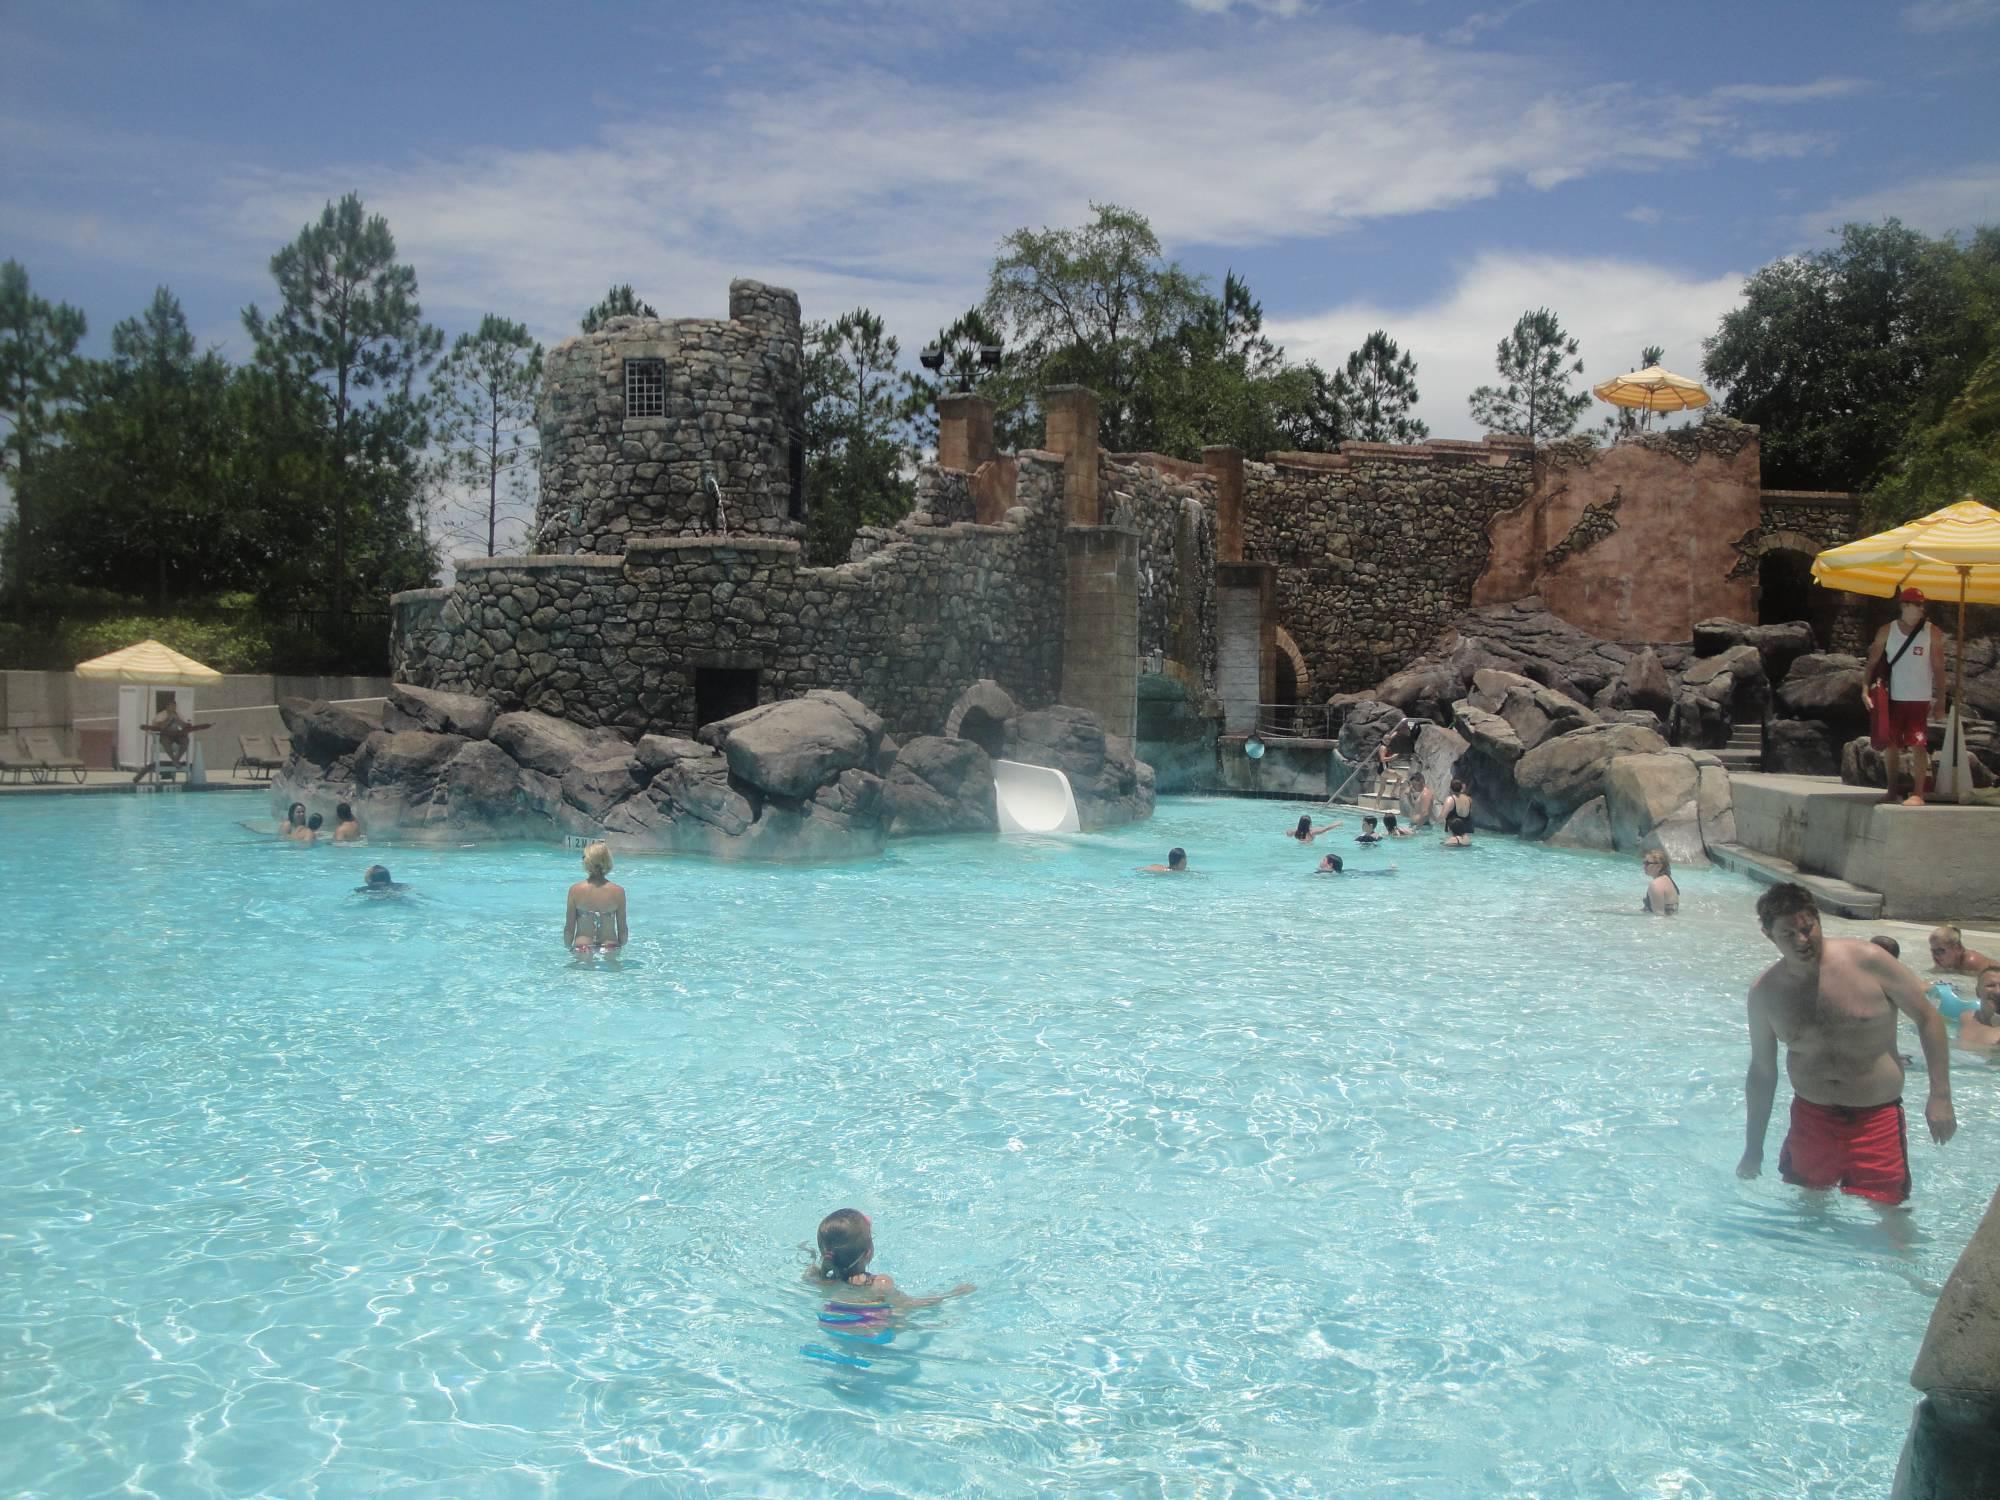 Pool at Portofino Bay photo